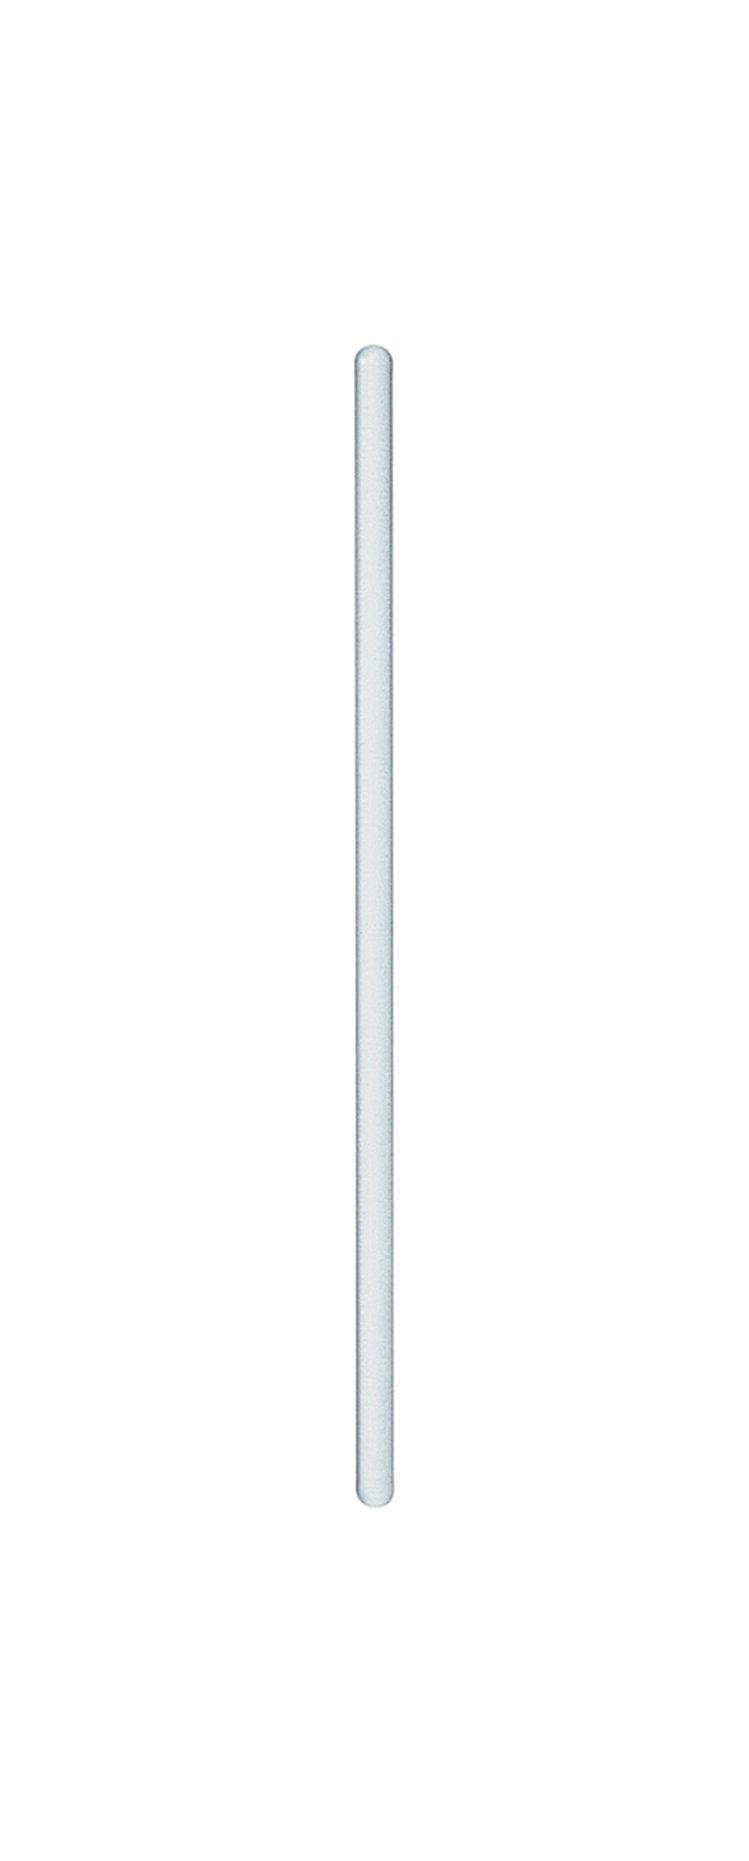 Kimble Borosilicate Glass Solid Stirring Rod, 10mm Diameter x 375mm L (Case of 200)